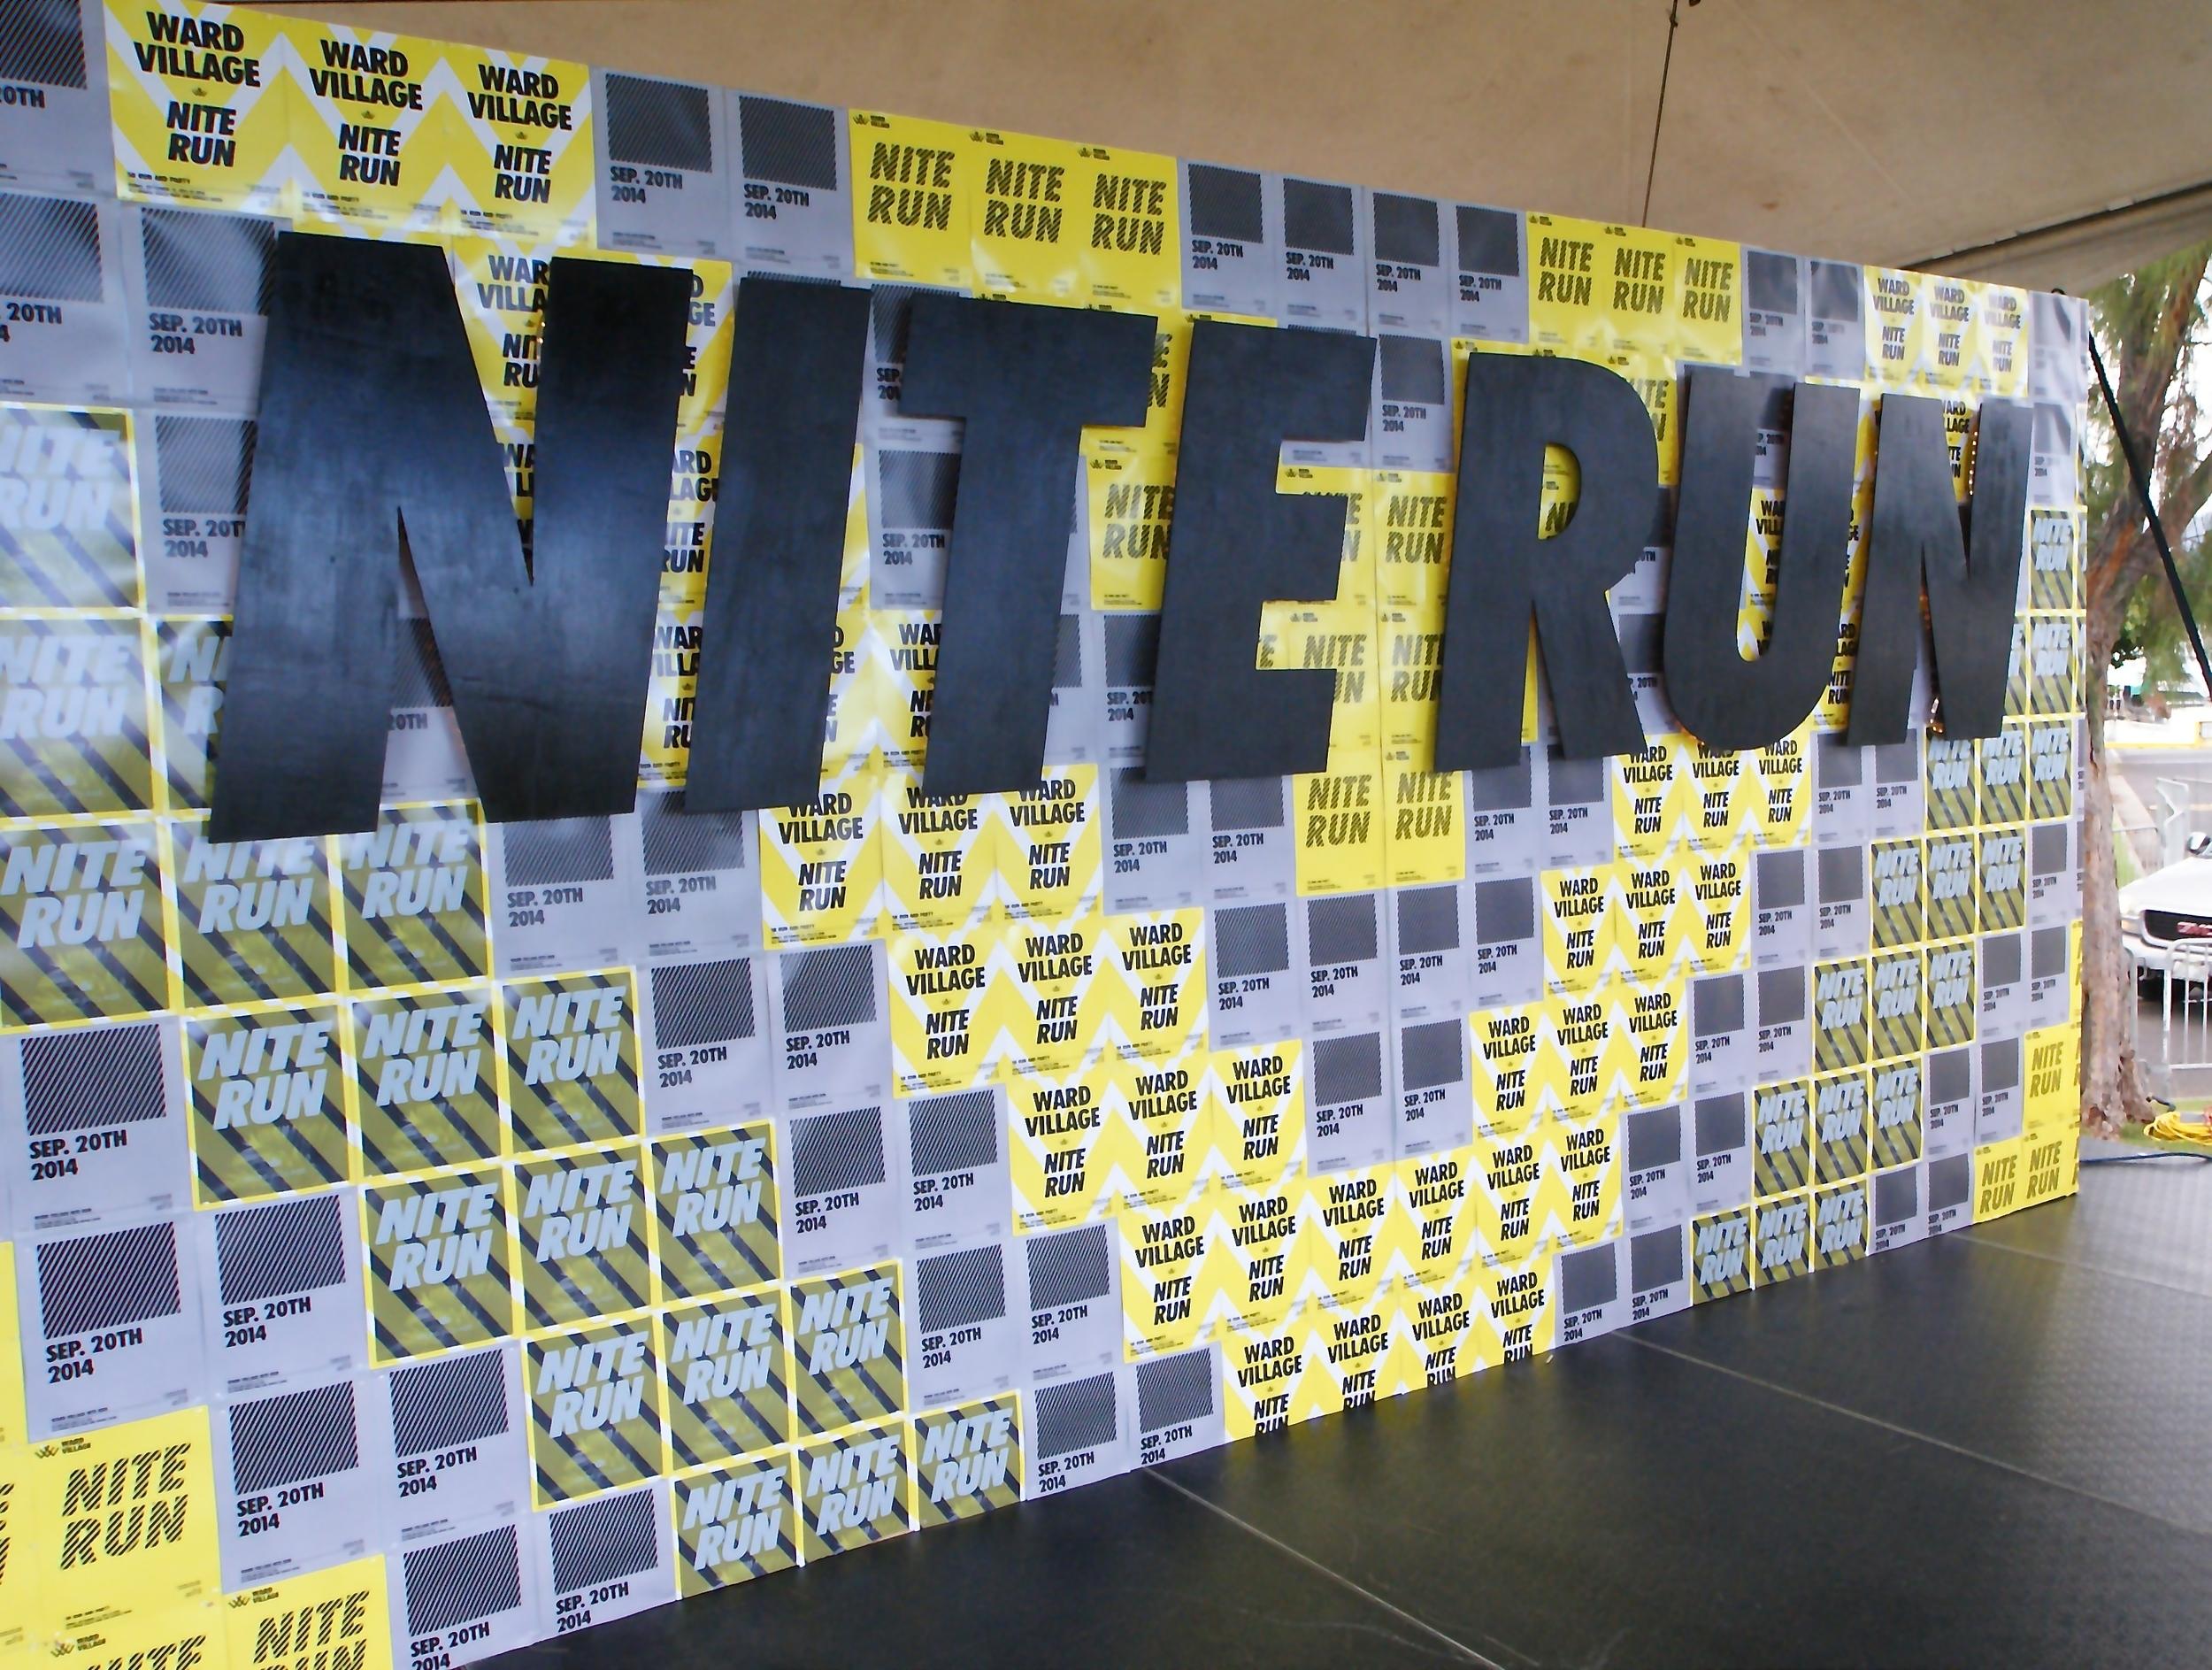 Nite-Run-Full-Backdrop